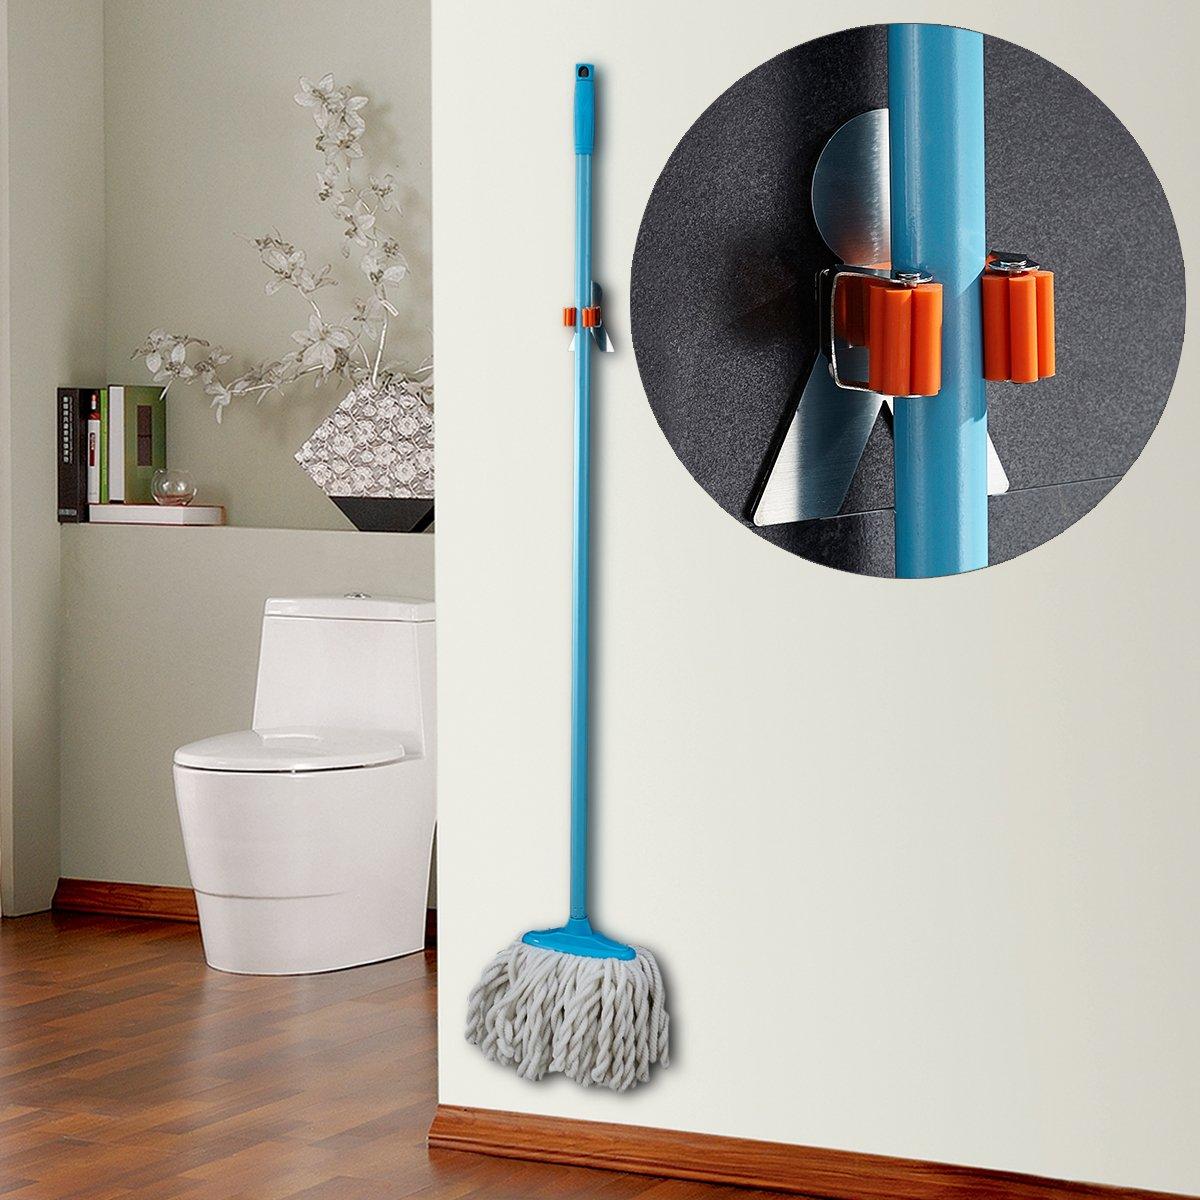 Bosszi SUS304 Stainless Steel Mop Broom Holder Racks Adhesive Wall Mount Bathroom Storage Organizer Mop Hanger (2 Pack) by Bosszi (Image #5)